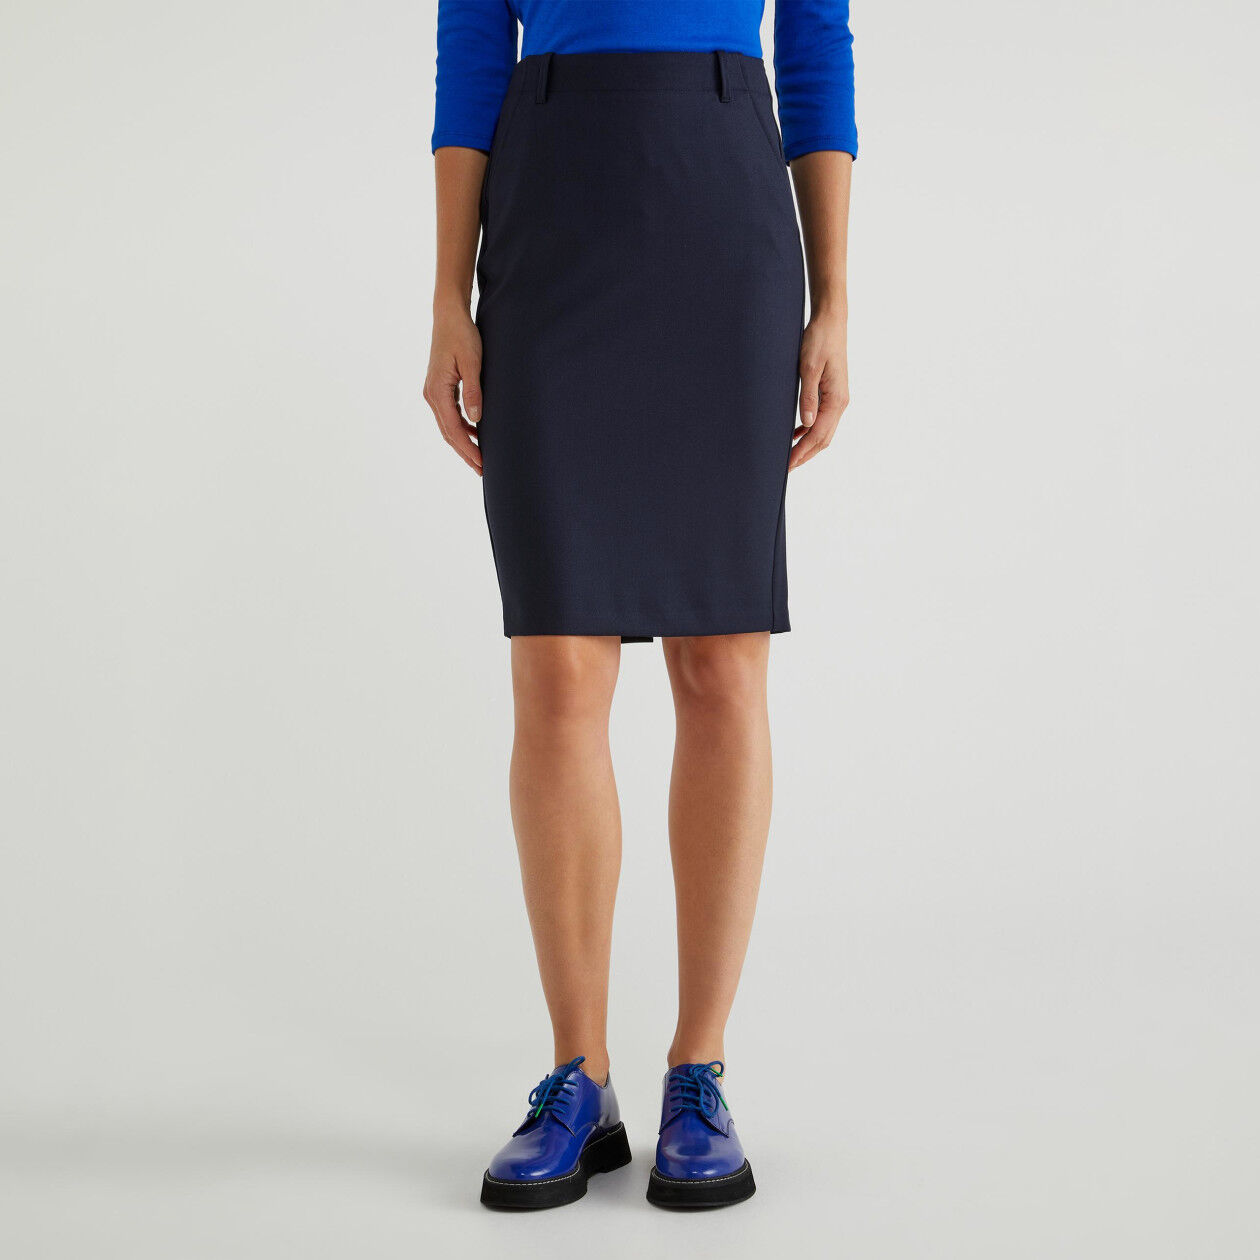 Falda de tubo de lana fría